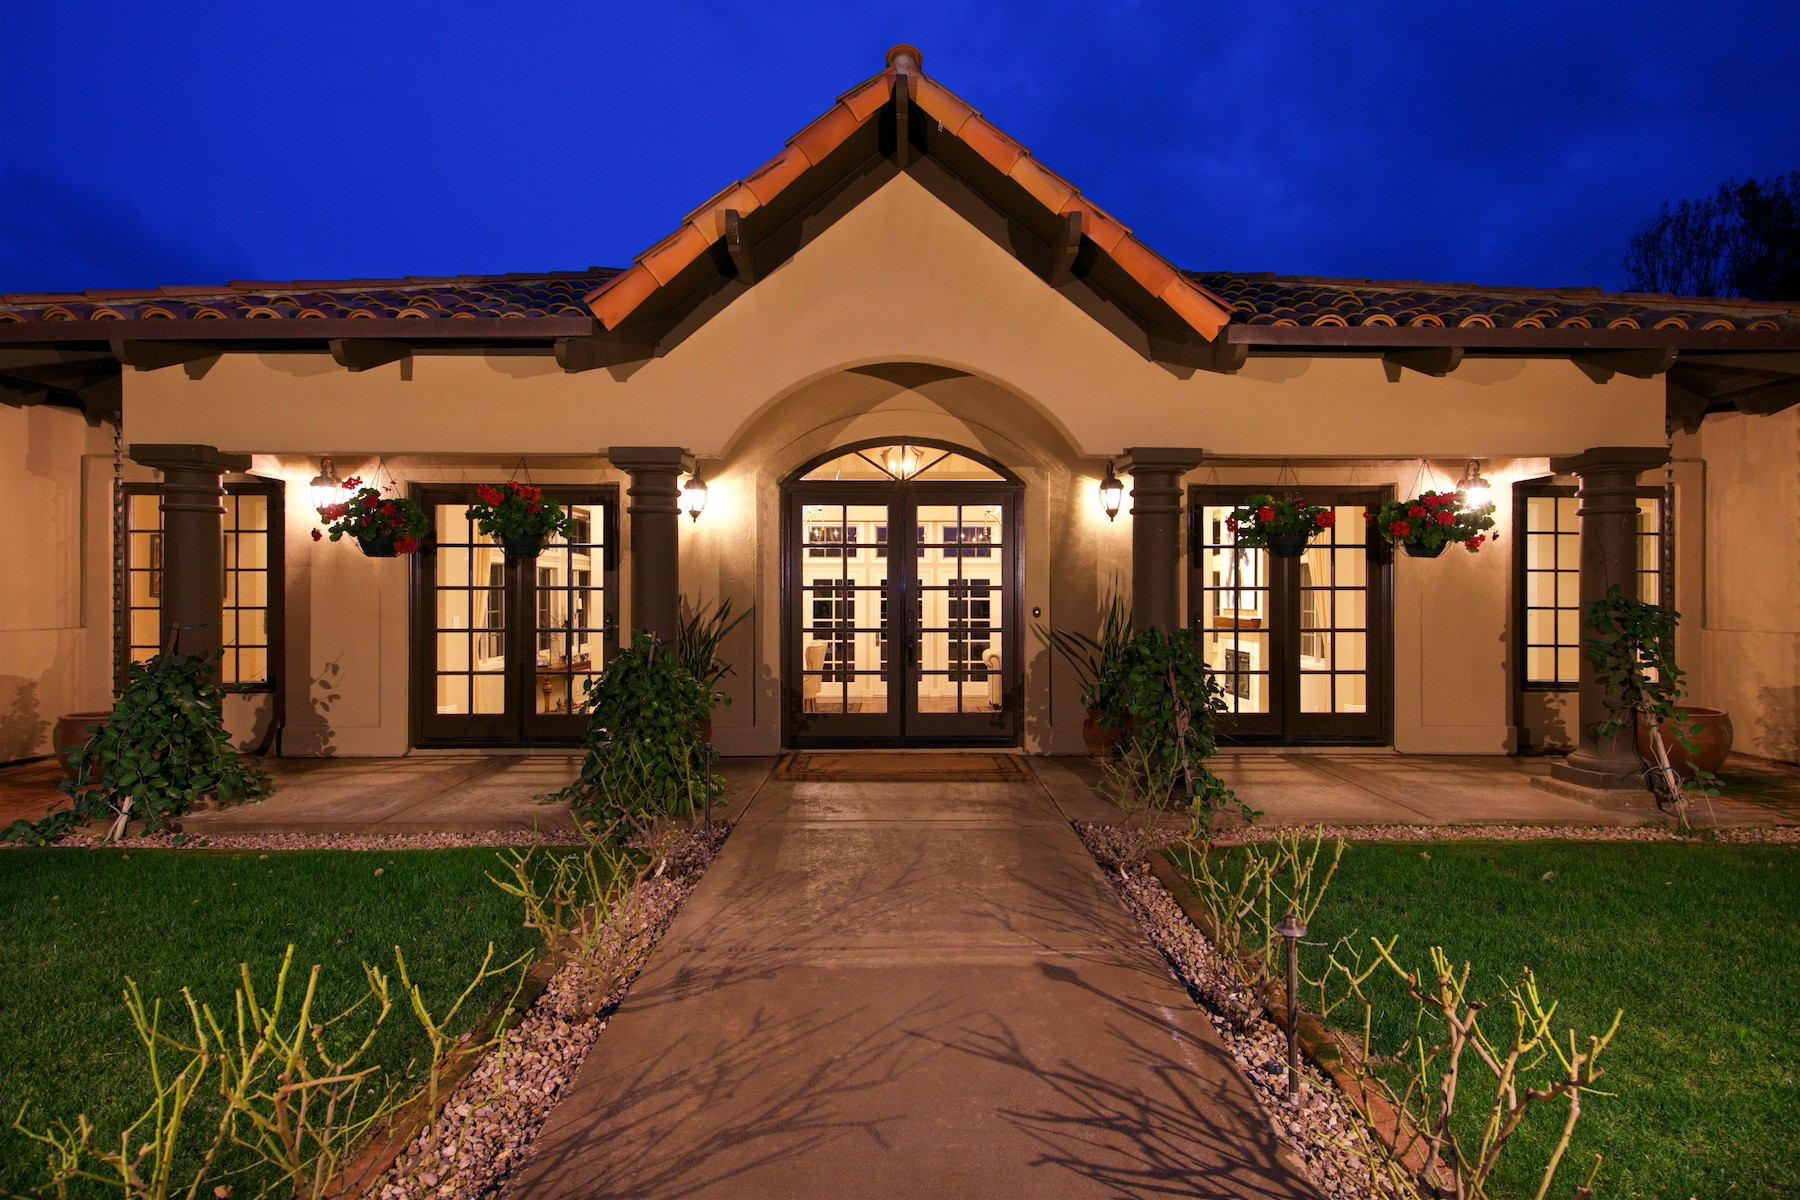 Single Family Home for Sale at 17577 Caminito de los Escoses Rancho Santa Fe, California 92067 United States